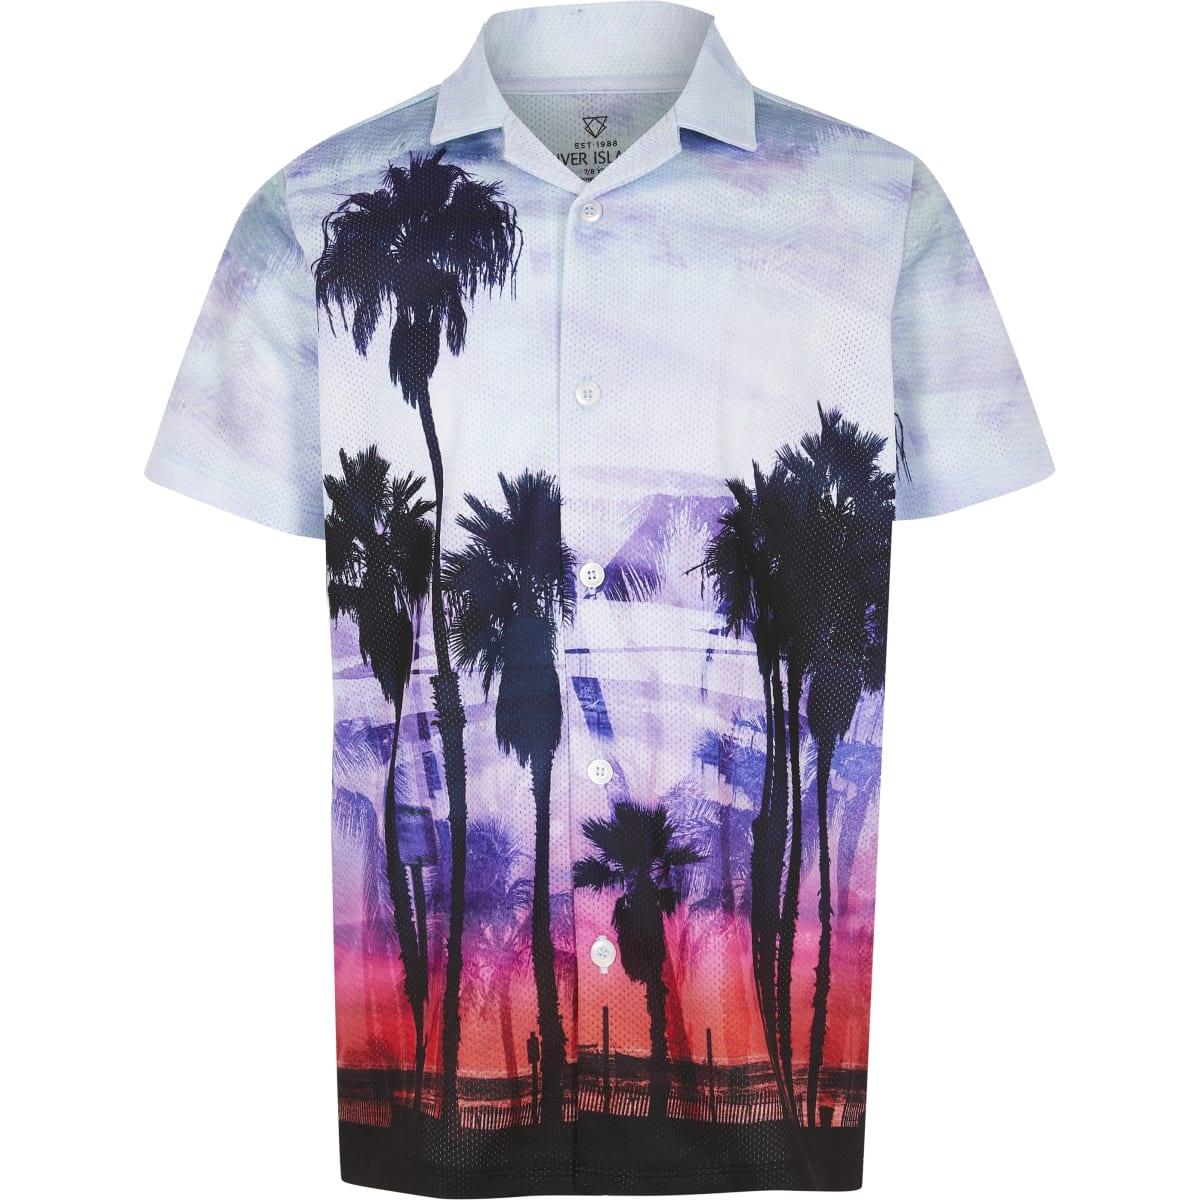 Boys blue palm print mesh shirt